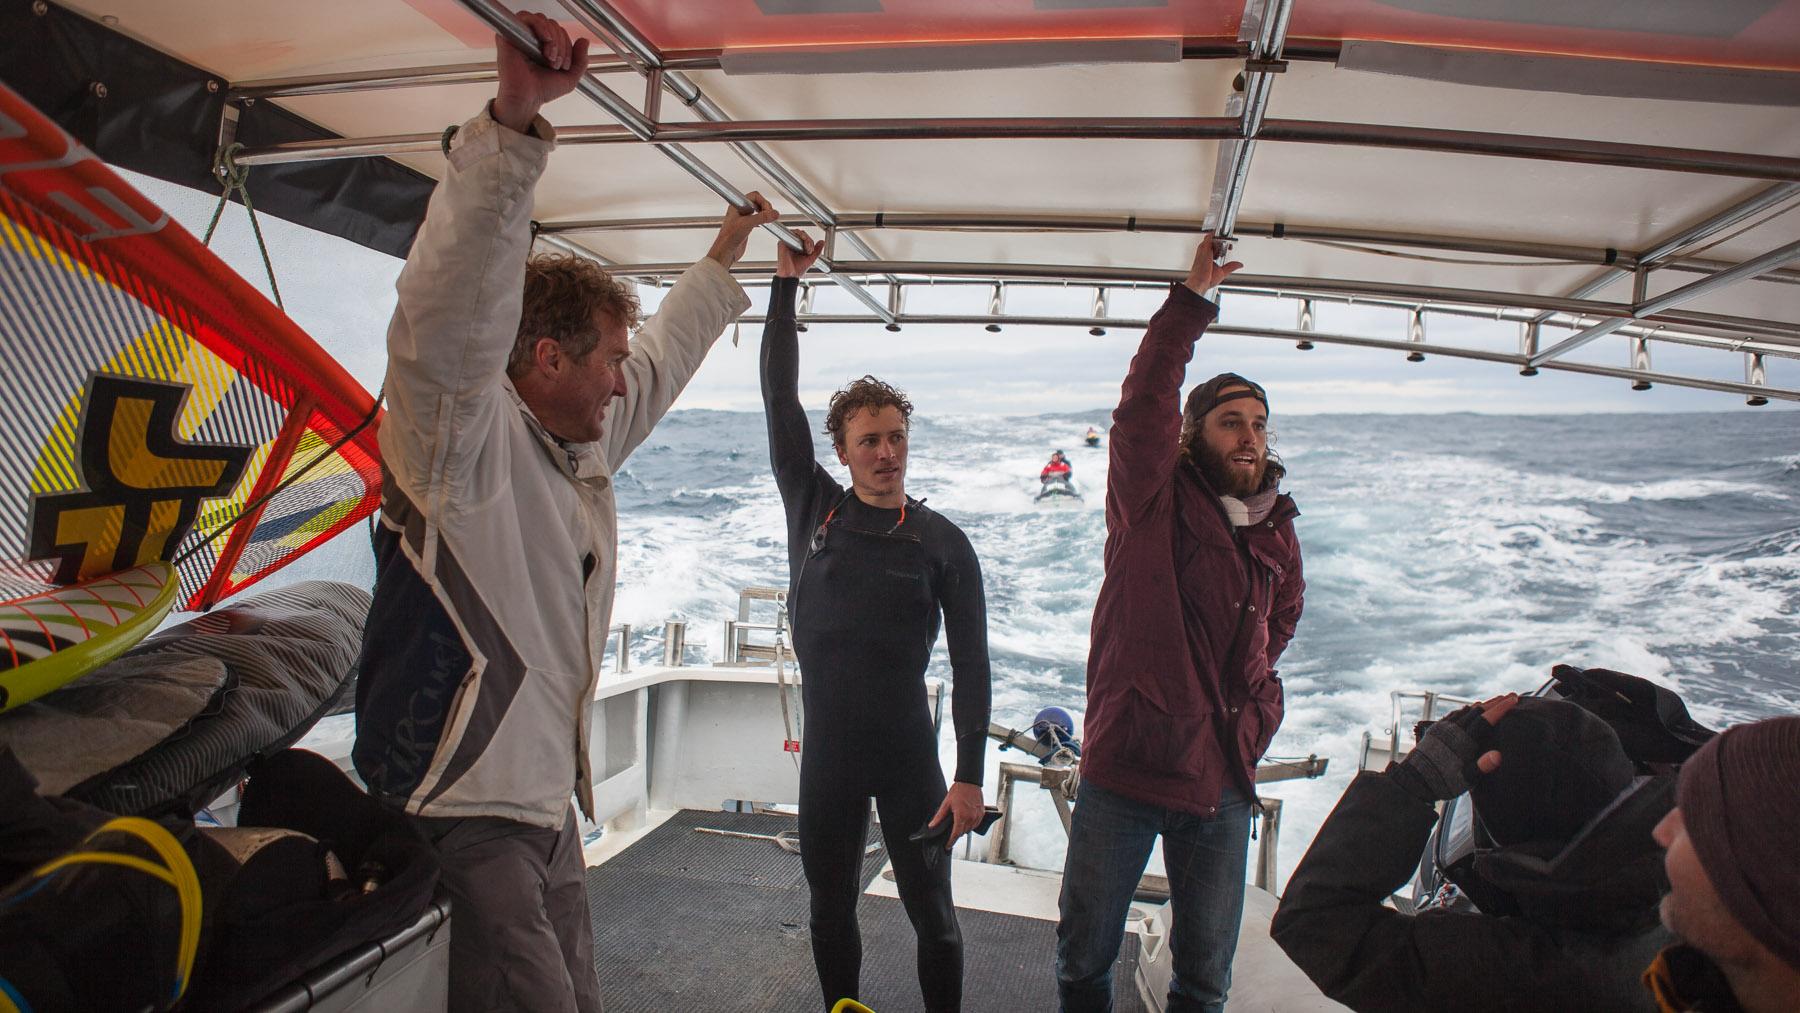 alastair mcleod successfully windsurfed pedra branca tasmania for red bull